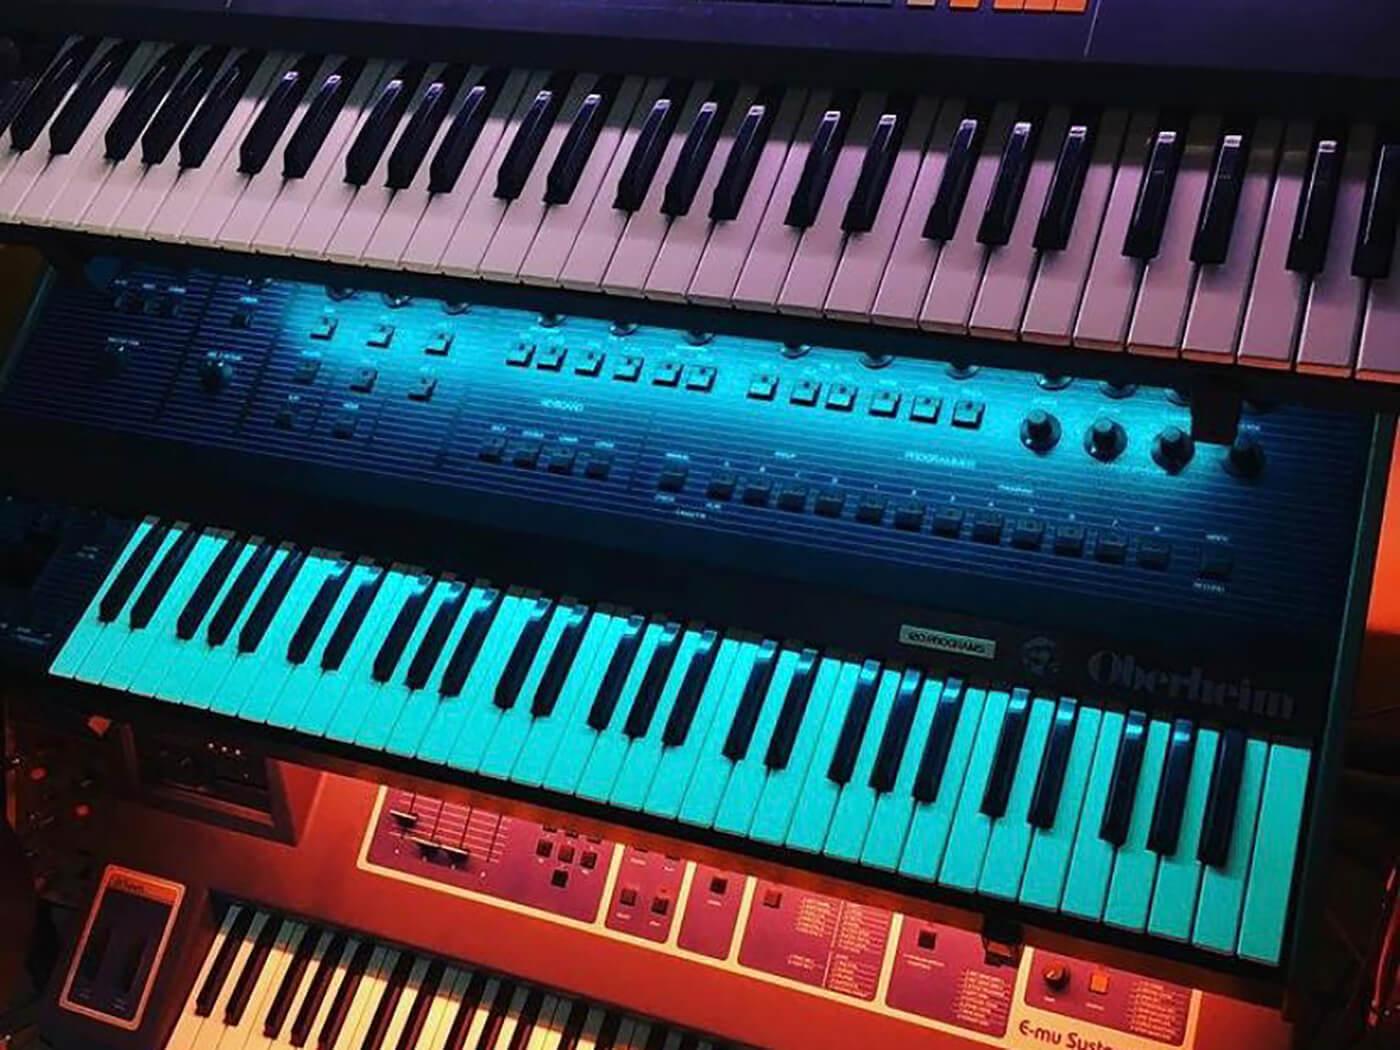 Martin Dubka's Studio Synths